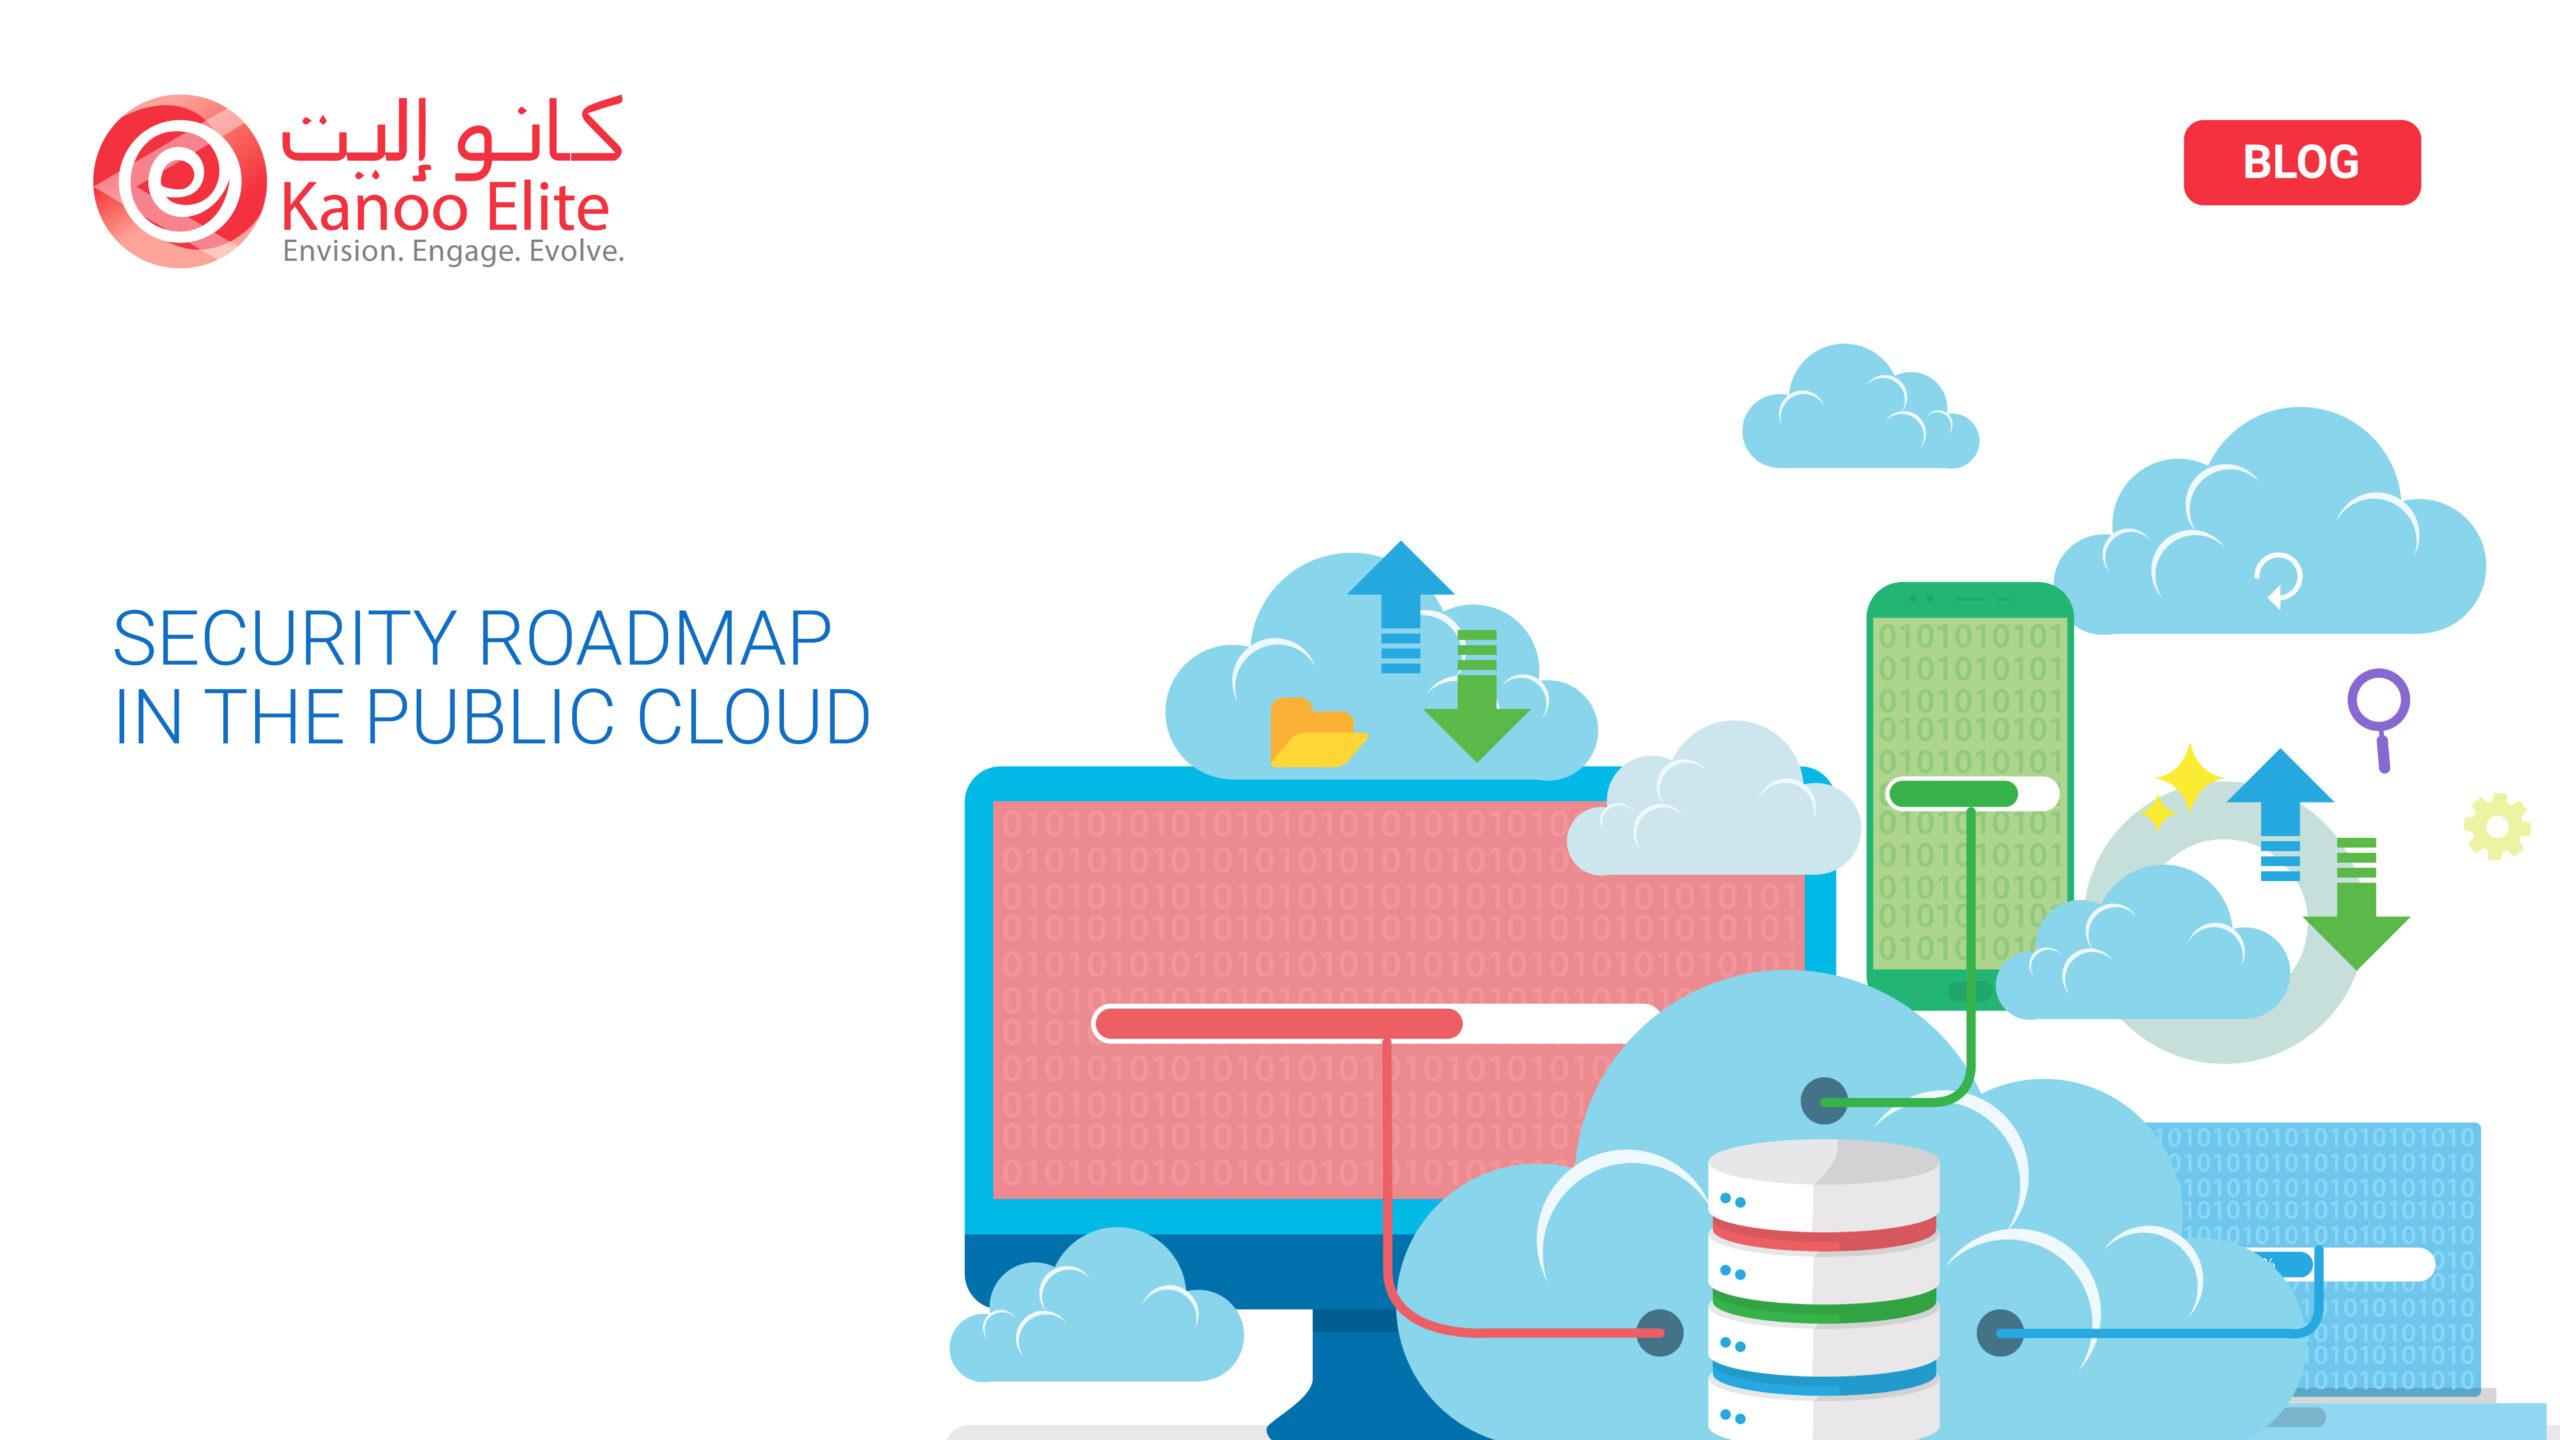 Security Roadmap in the Public Cloud